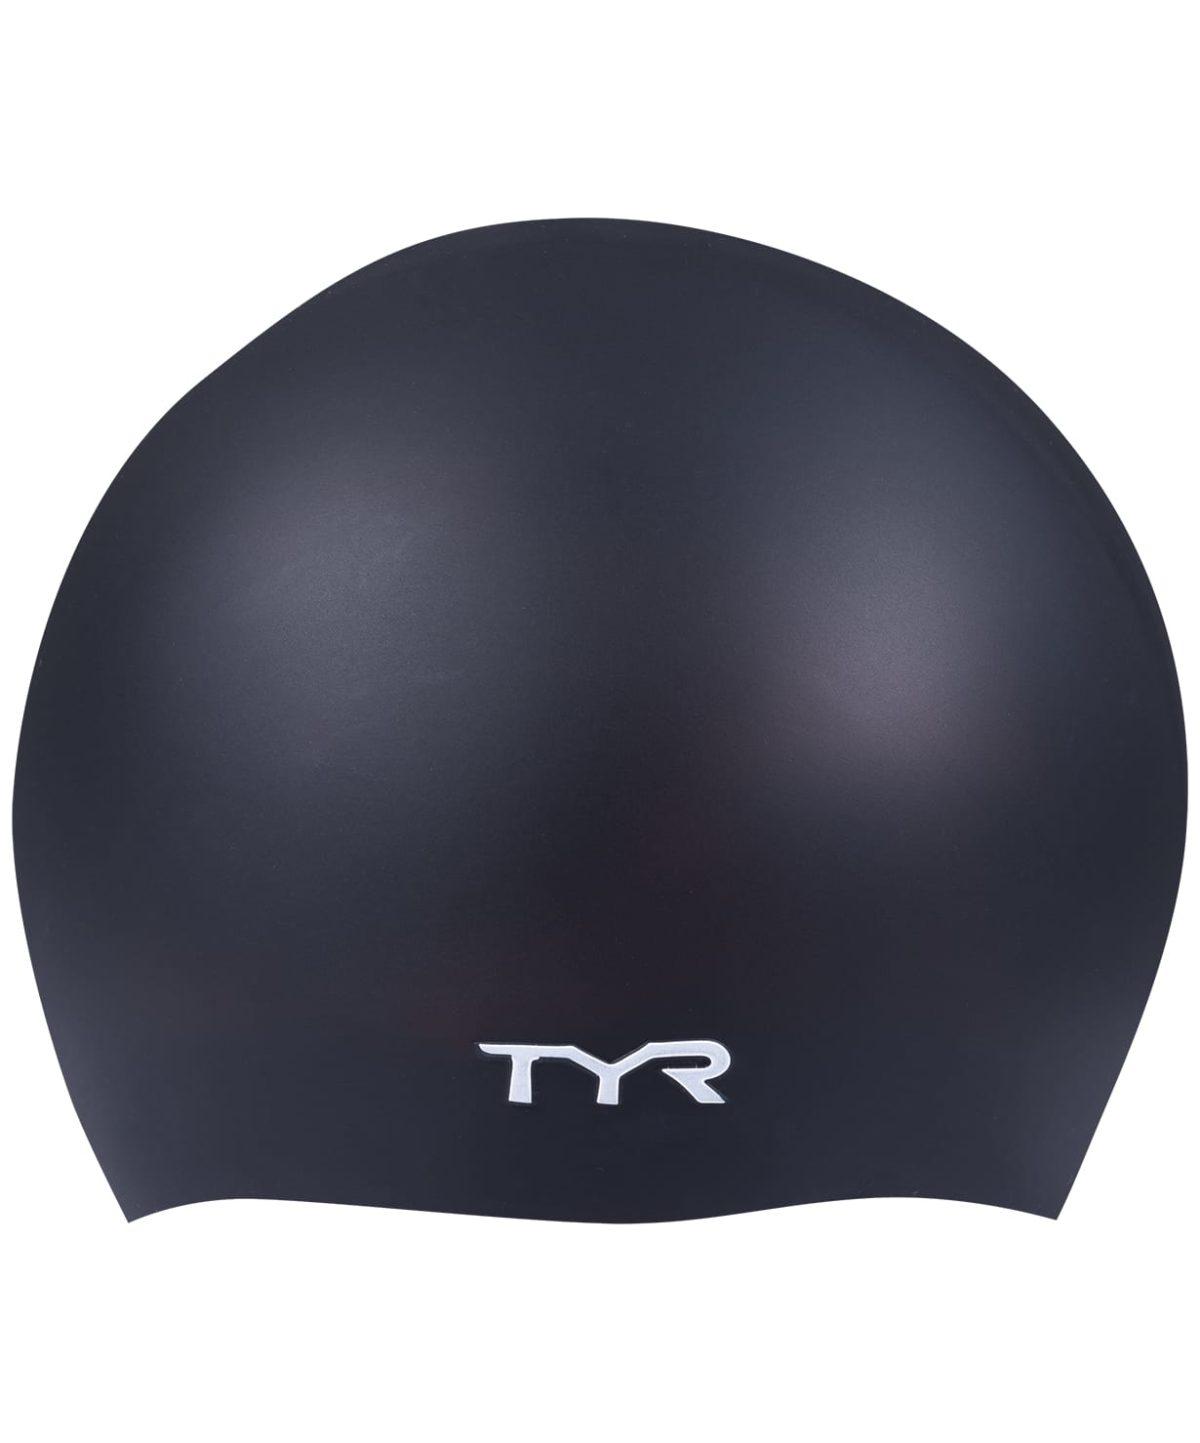 TYR Wrinkle Free Silicone Cap Шапочка для плавания силикон  LCS: чёрный - 1